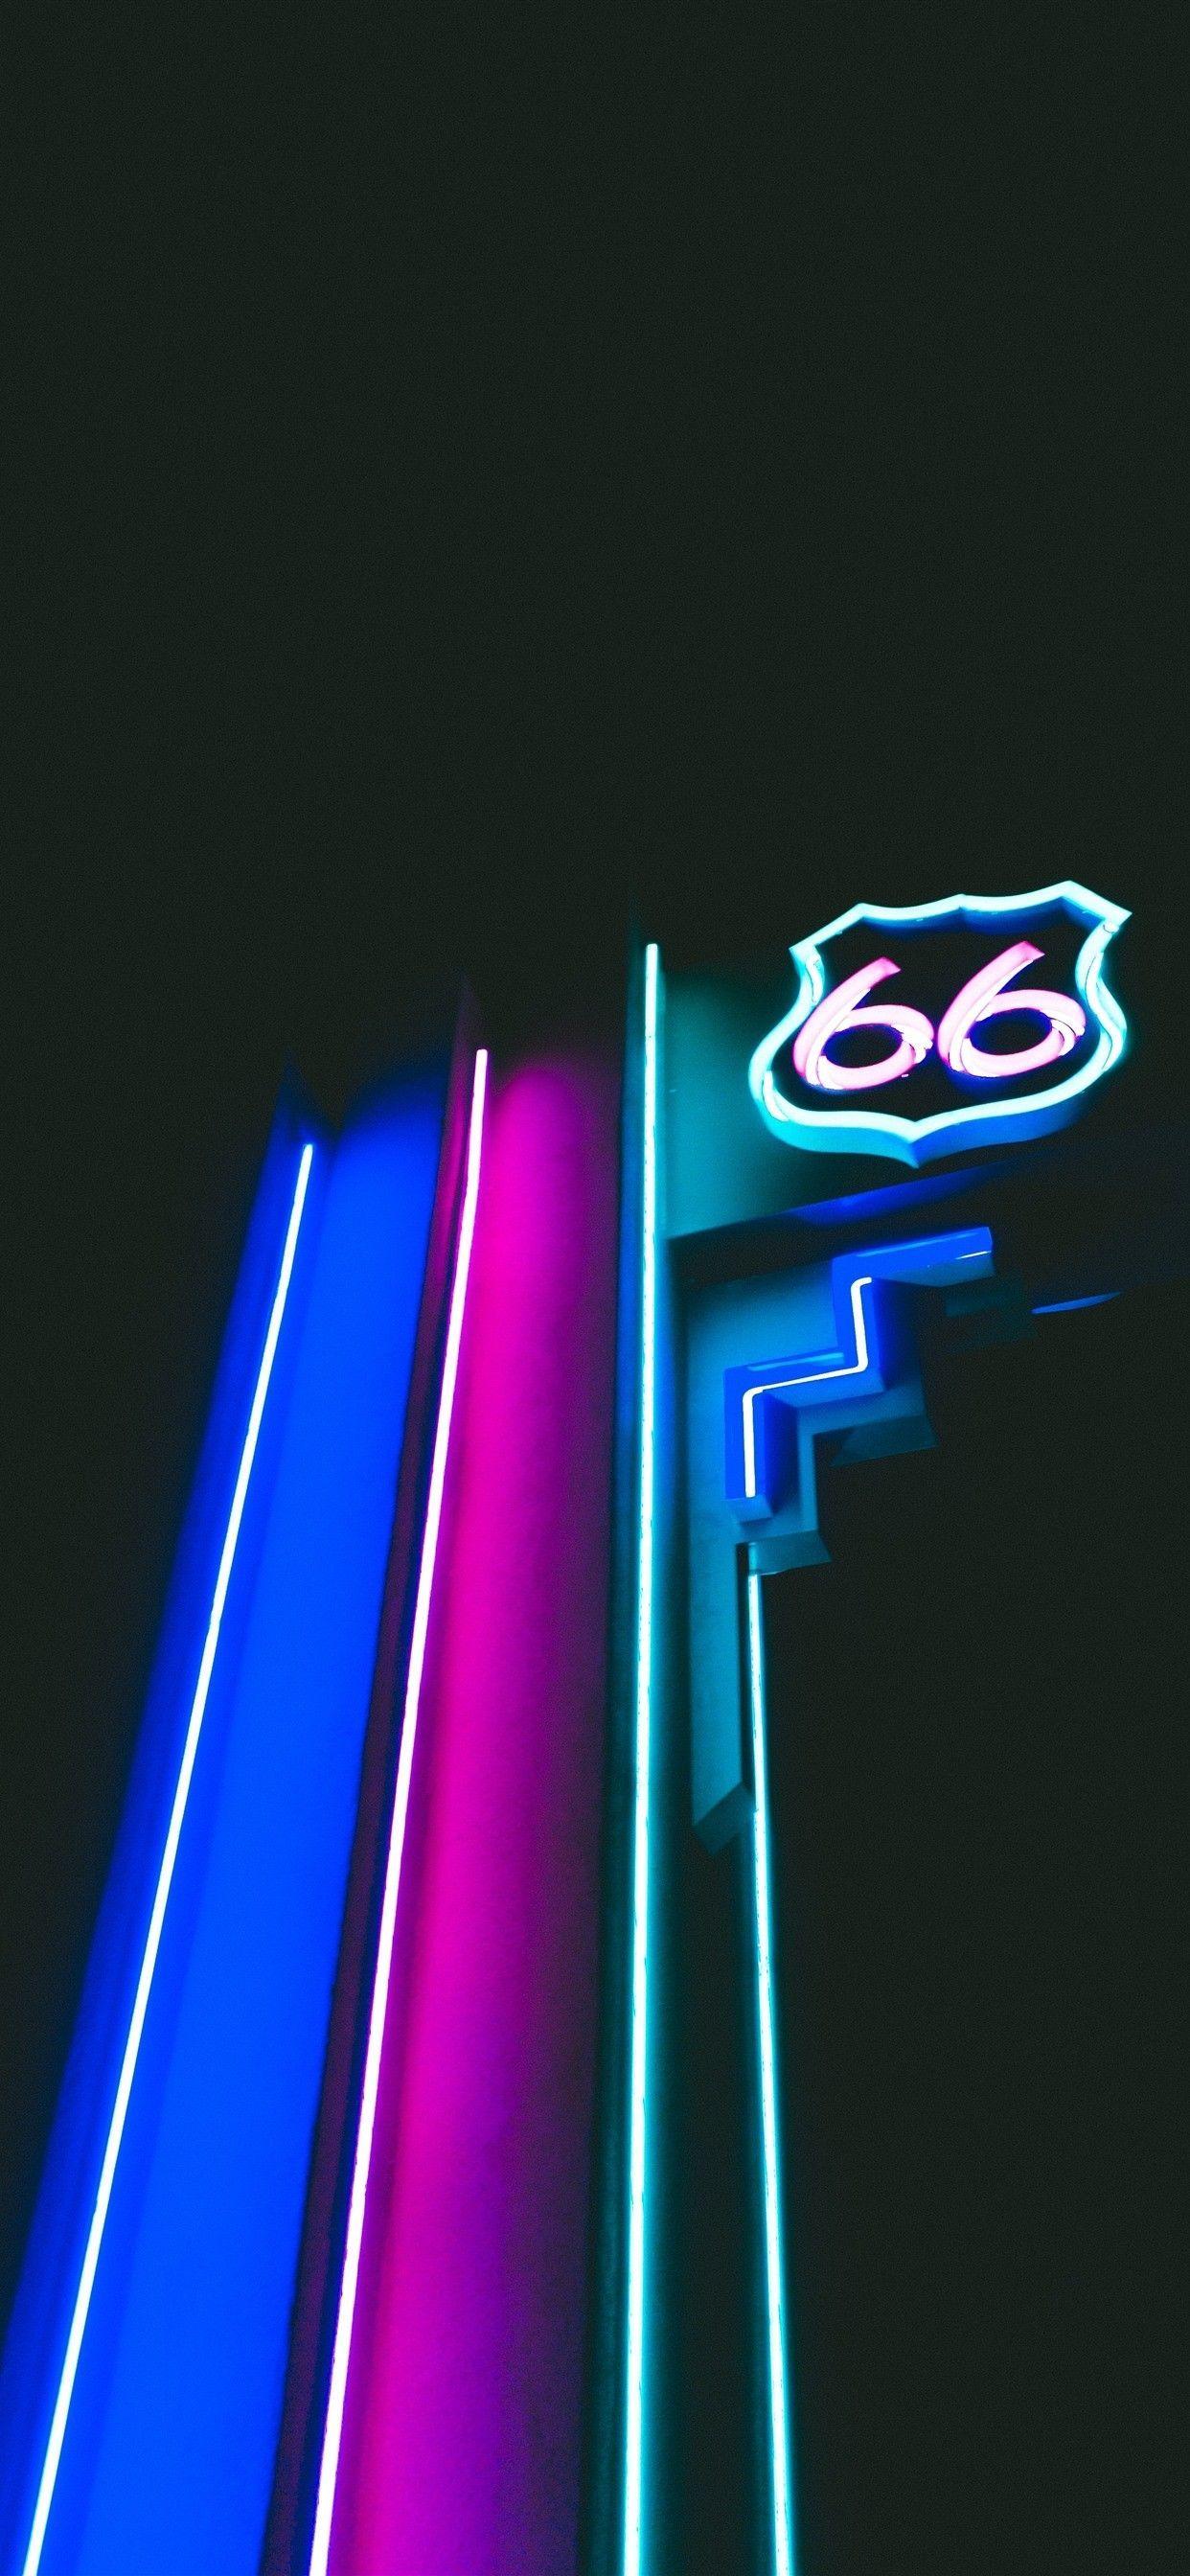 Download Aesthetic Neon Wallpaper Iphone 4k Images In 2021 Neon Light Wallpaper Neon Wallpaper Heart Iphone Wallpaper Aesthetic iphone xs max wallpaper tumblr